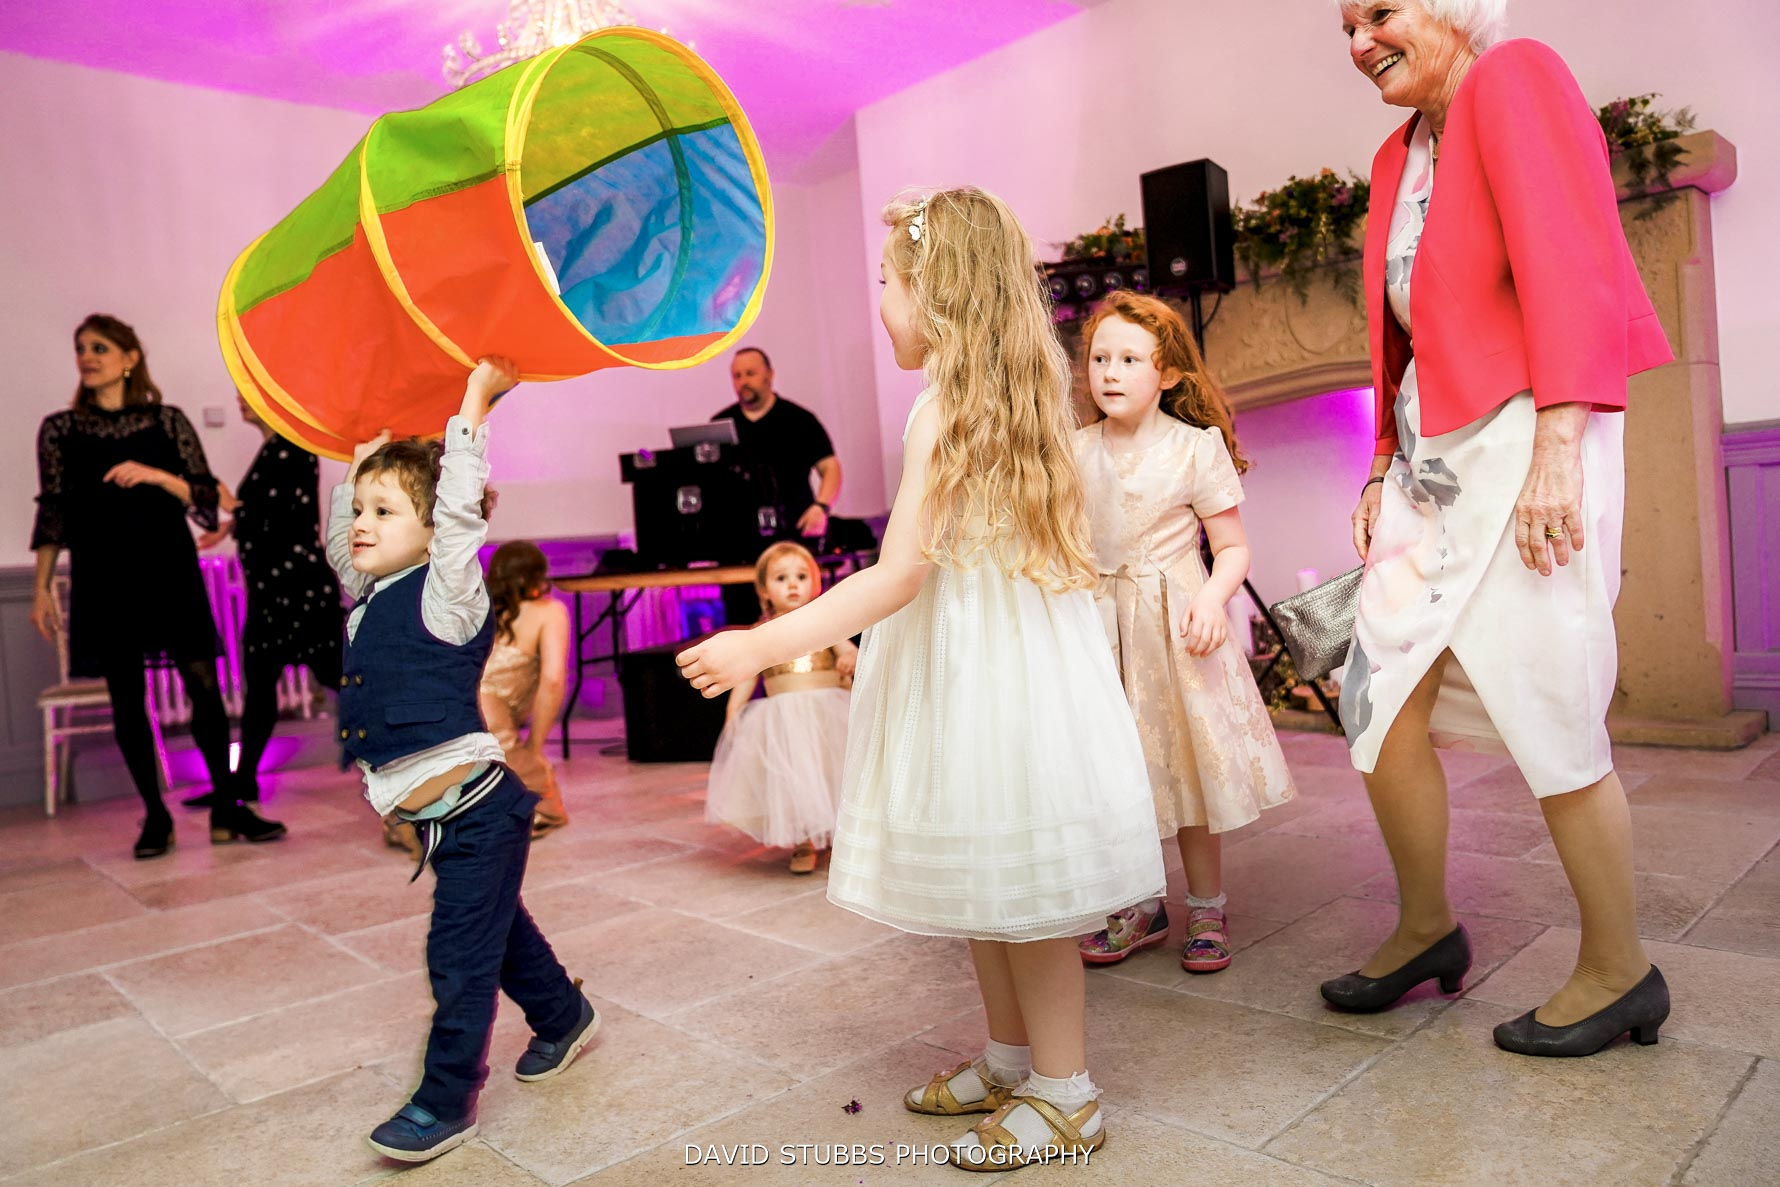 kids playing on the dance floor